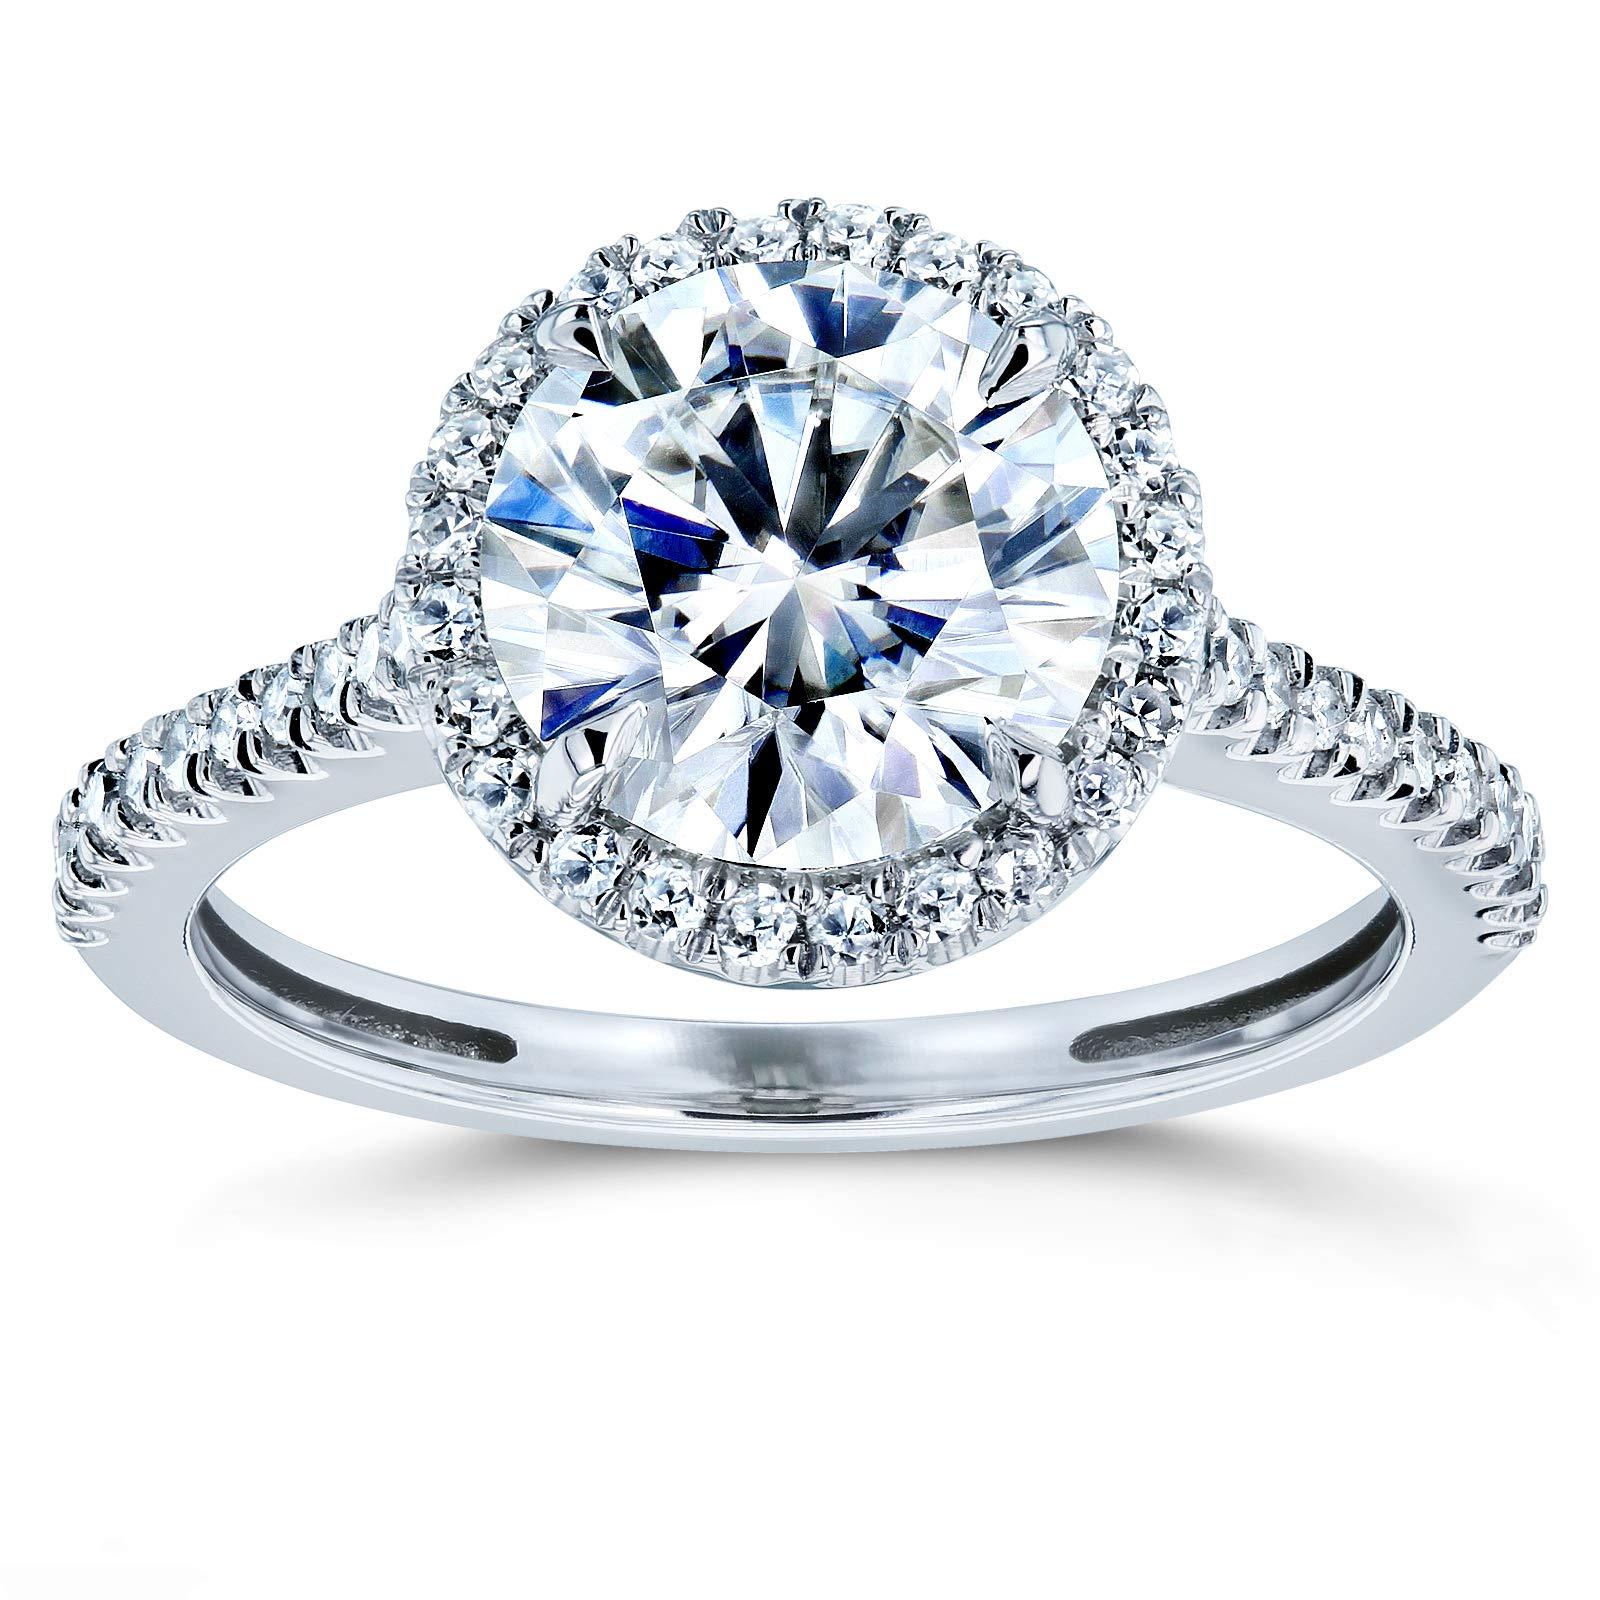 Round Brilliant Forever One Moissanite and Diamond Halo Engagement Ring 2 1/6 CTW 14k White Gold (DEF/VS, GH/I), 5.5